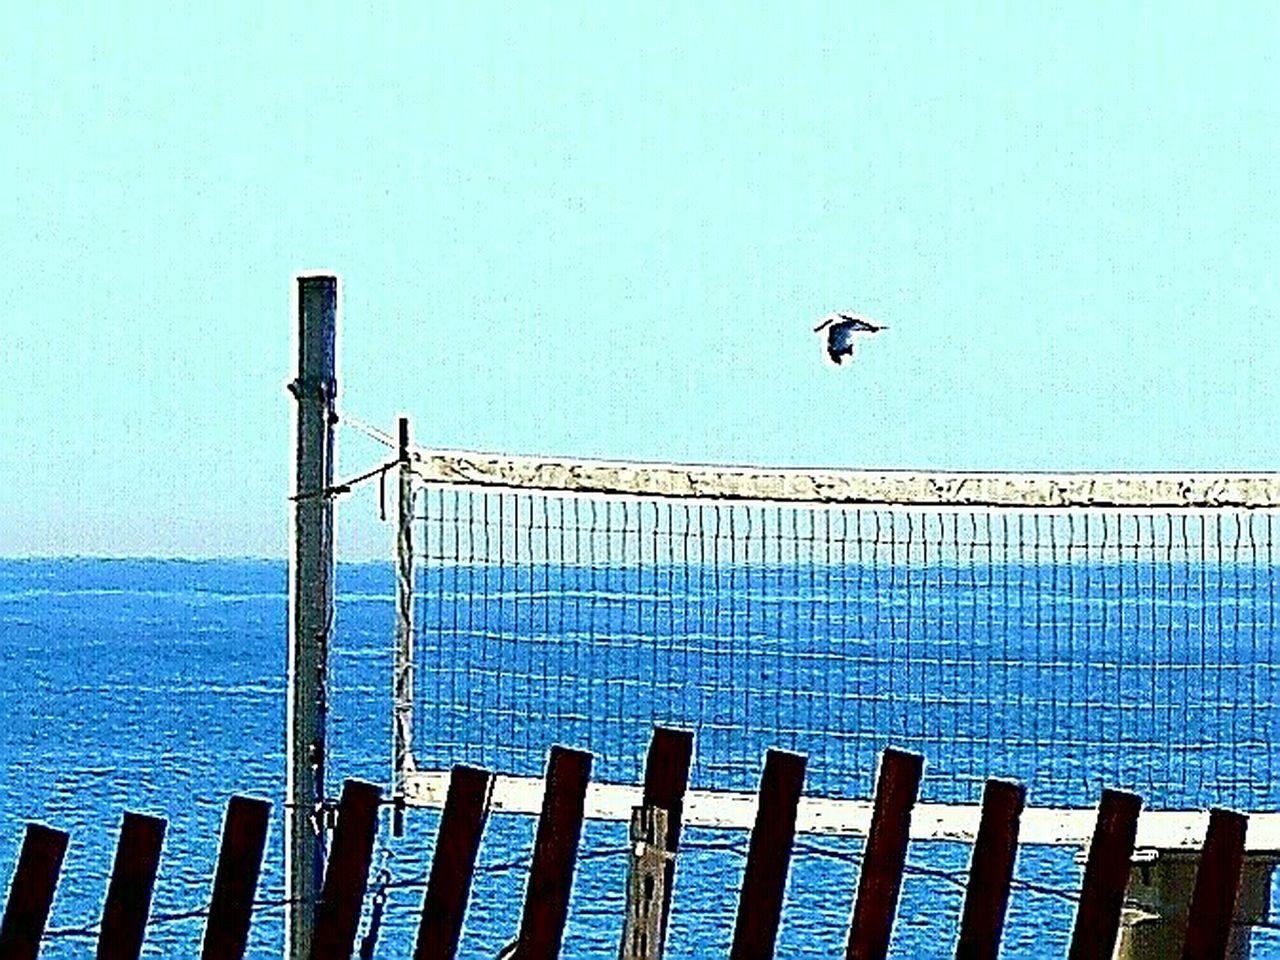 Bird Netting Outdoors Sea Clear Sky No People Beach EyeEm Gallery The Week On Eyem EyeEm Best Shots